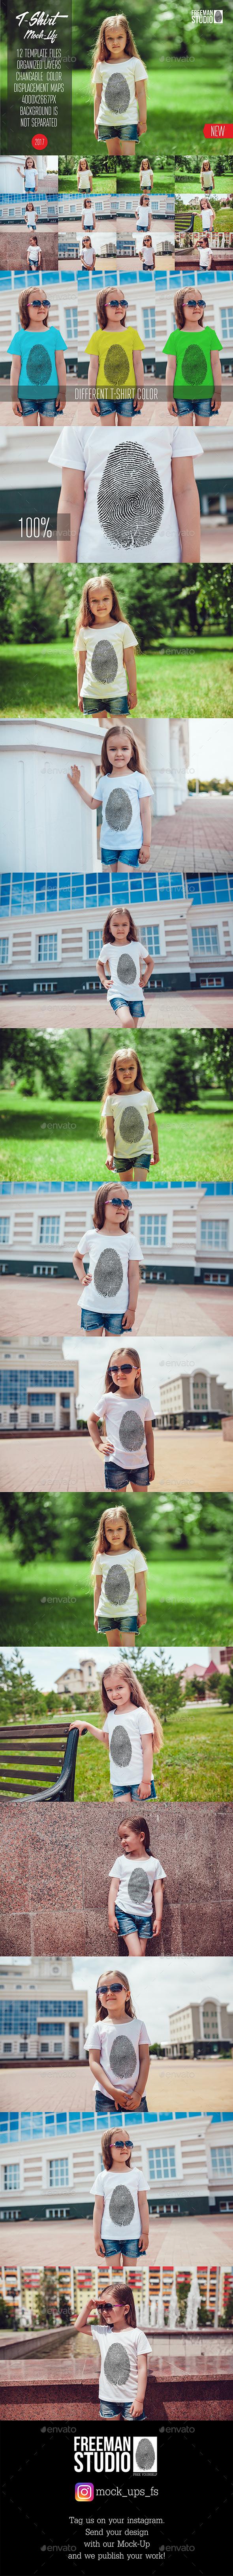 Kids T-Shirt Mock-Up Vol.6 2017 - Product Mock-Ups Graphics